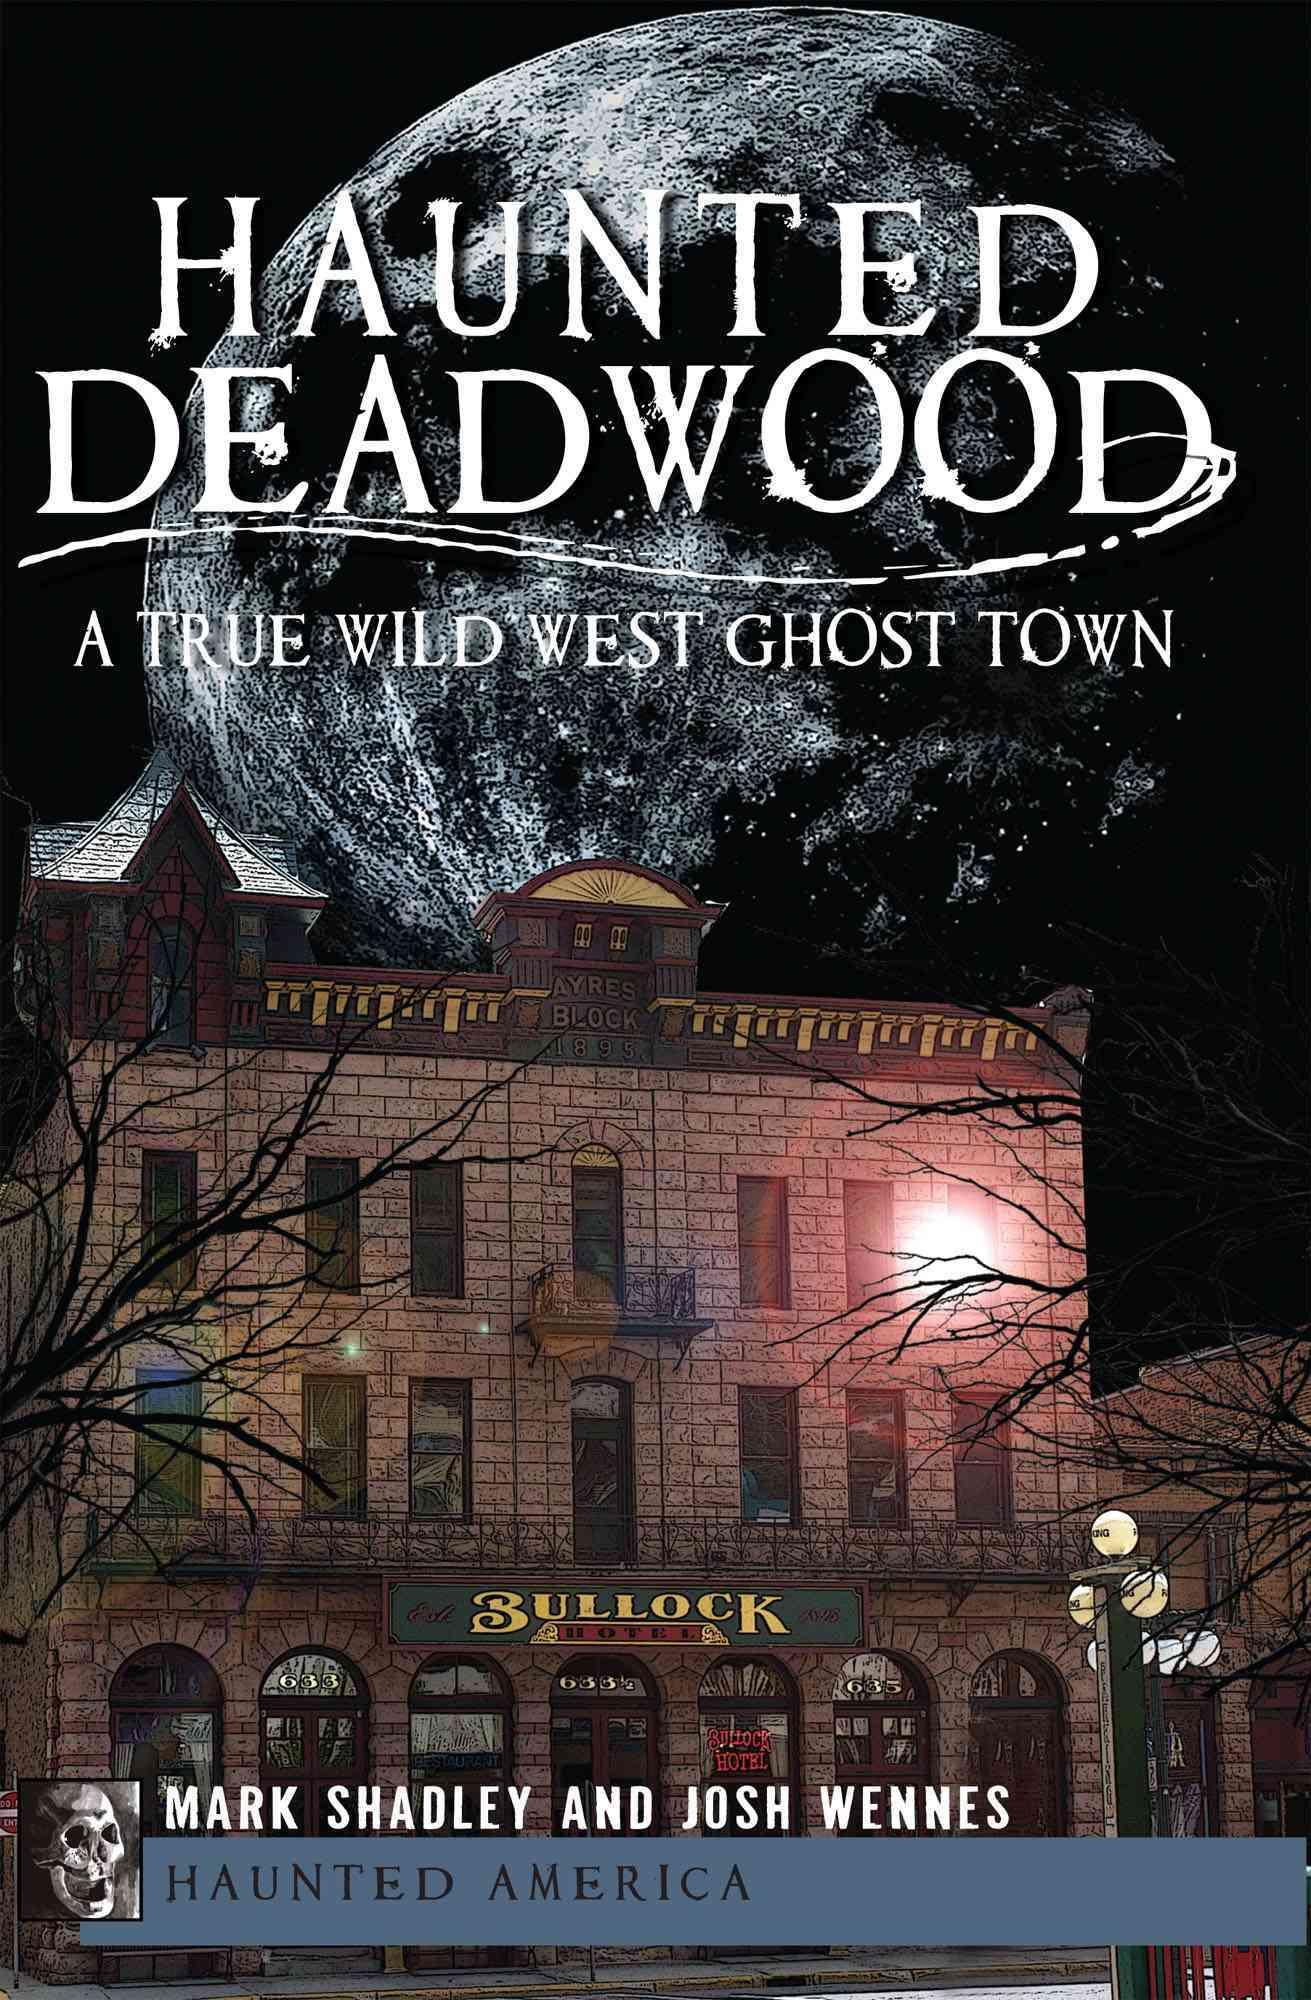 Haunted Deadwood: A True Wild West Ghost Town (Paperback)